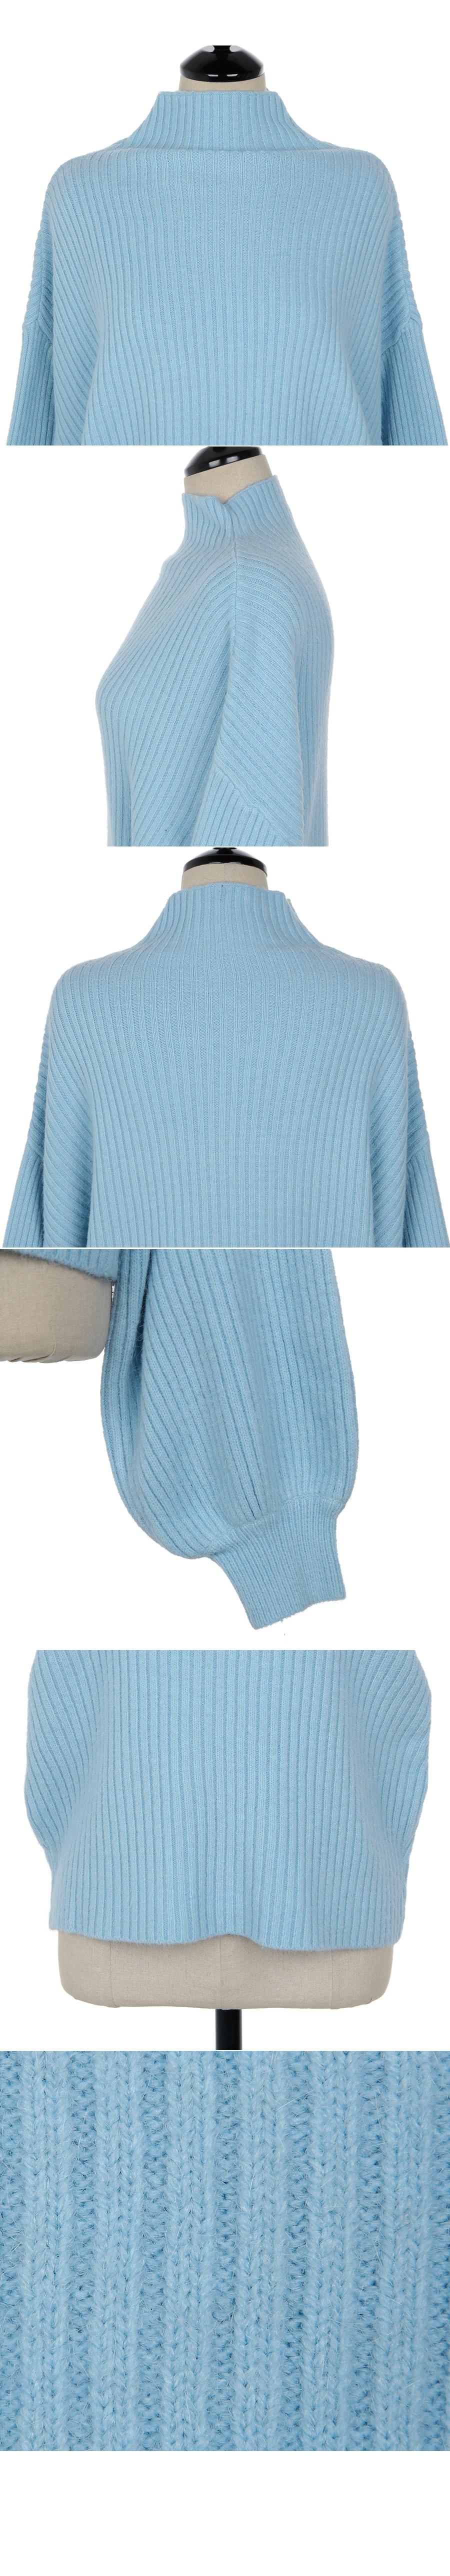 Goliath balloon knit